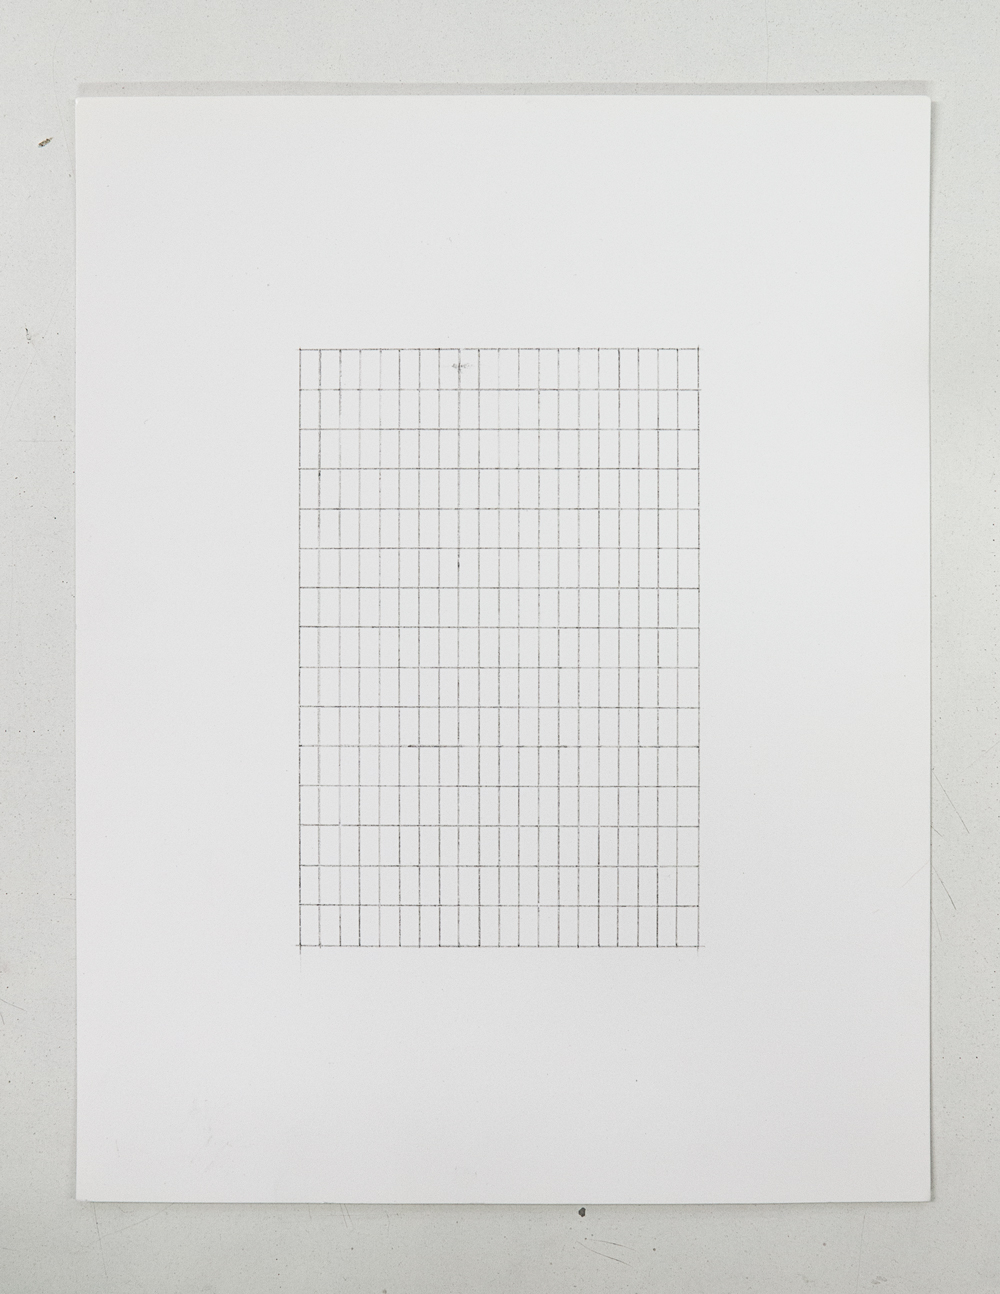 (PRISONTIME/PRISONINME: Transition to Metric)   5mm x 10mm on 10cm x 15cm  ,2014   Pencil on semi-matte inkjet fiber paper, 8.5 in.x 11 in.